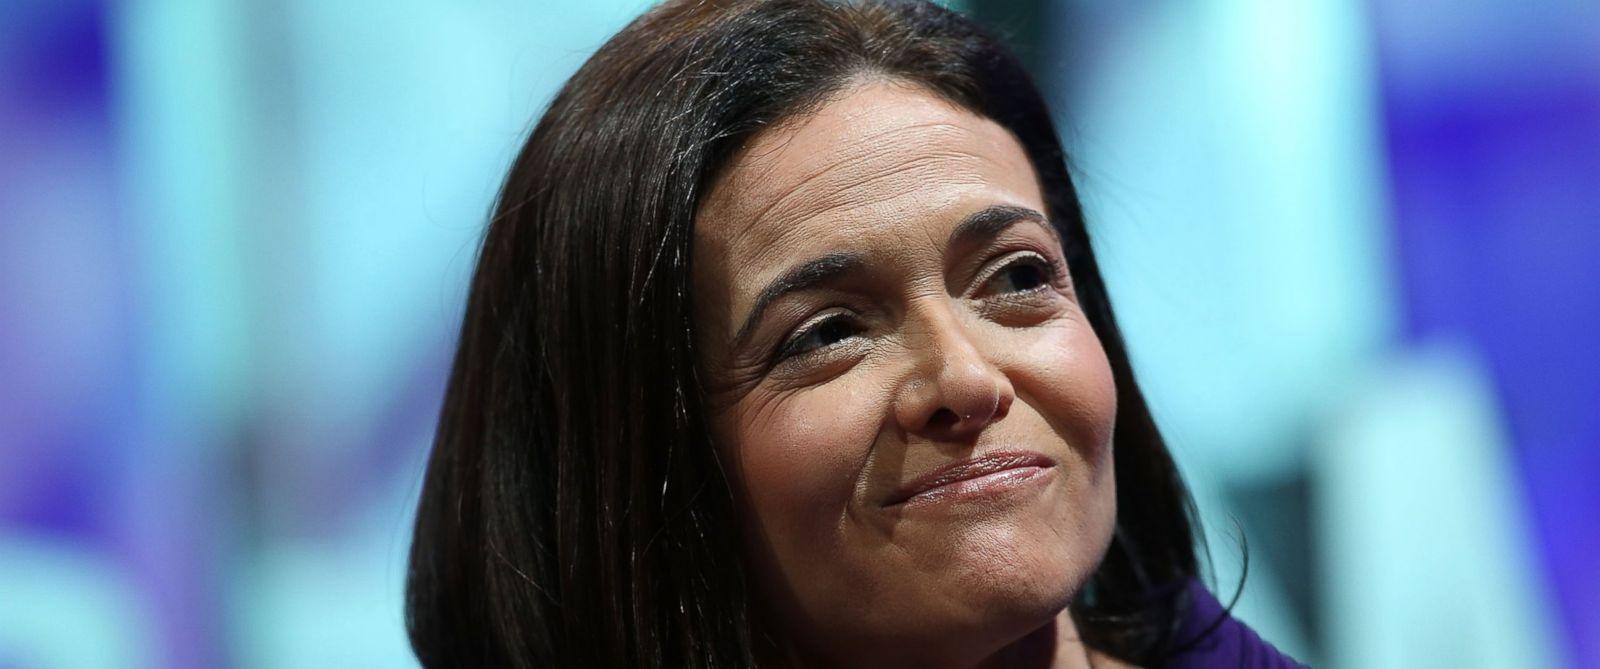 PHOTO: Facebook COO Sheryl Sandberg speaks during the Fortune Global Forum on Nov. 3, 2015 in San Francisco, California.